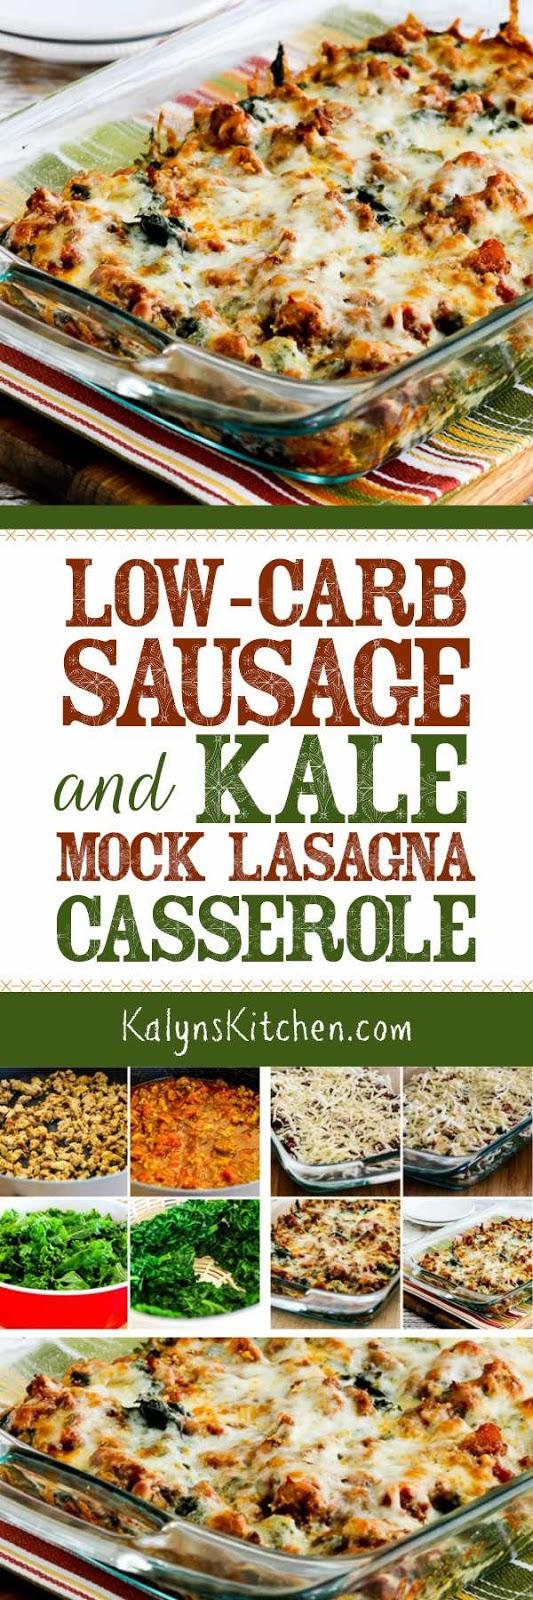 Kalyn's Kitchen®: Low-Carb Sausage and Kale Mock Lasagna Casserole